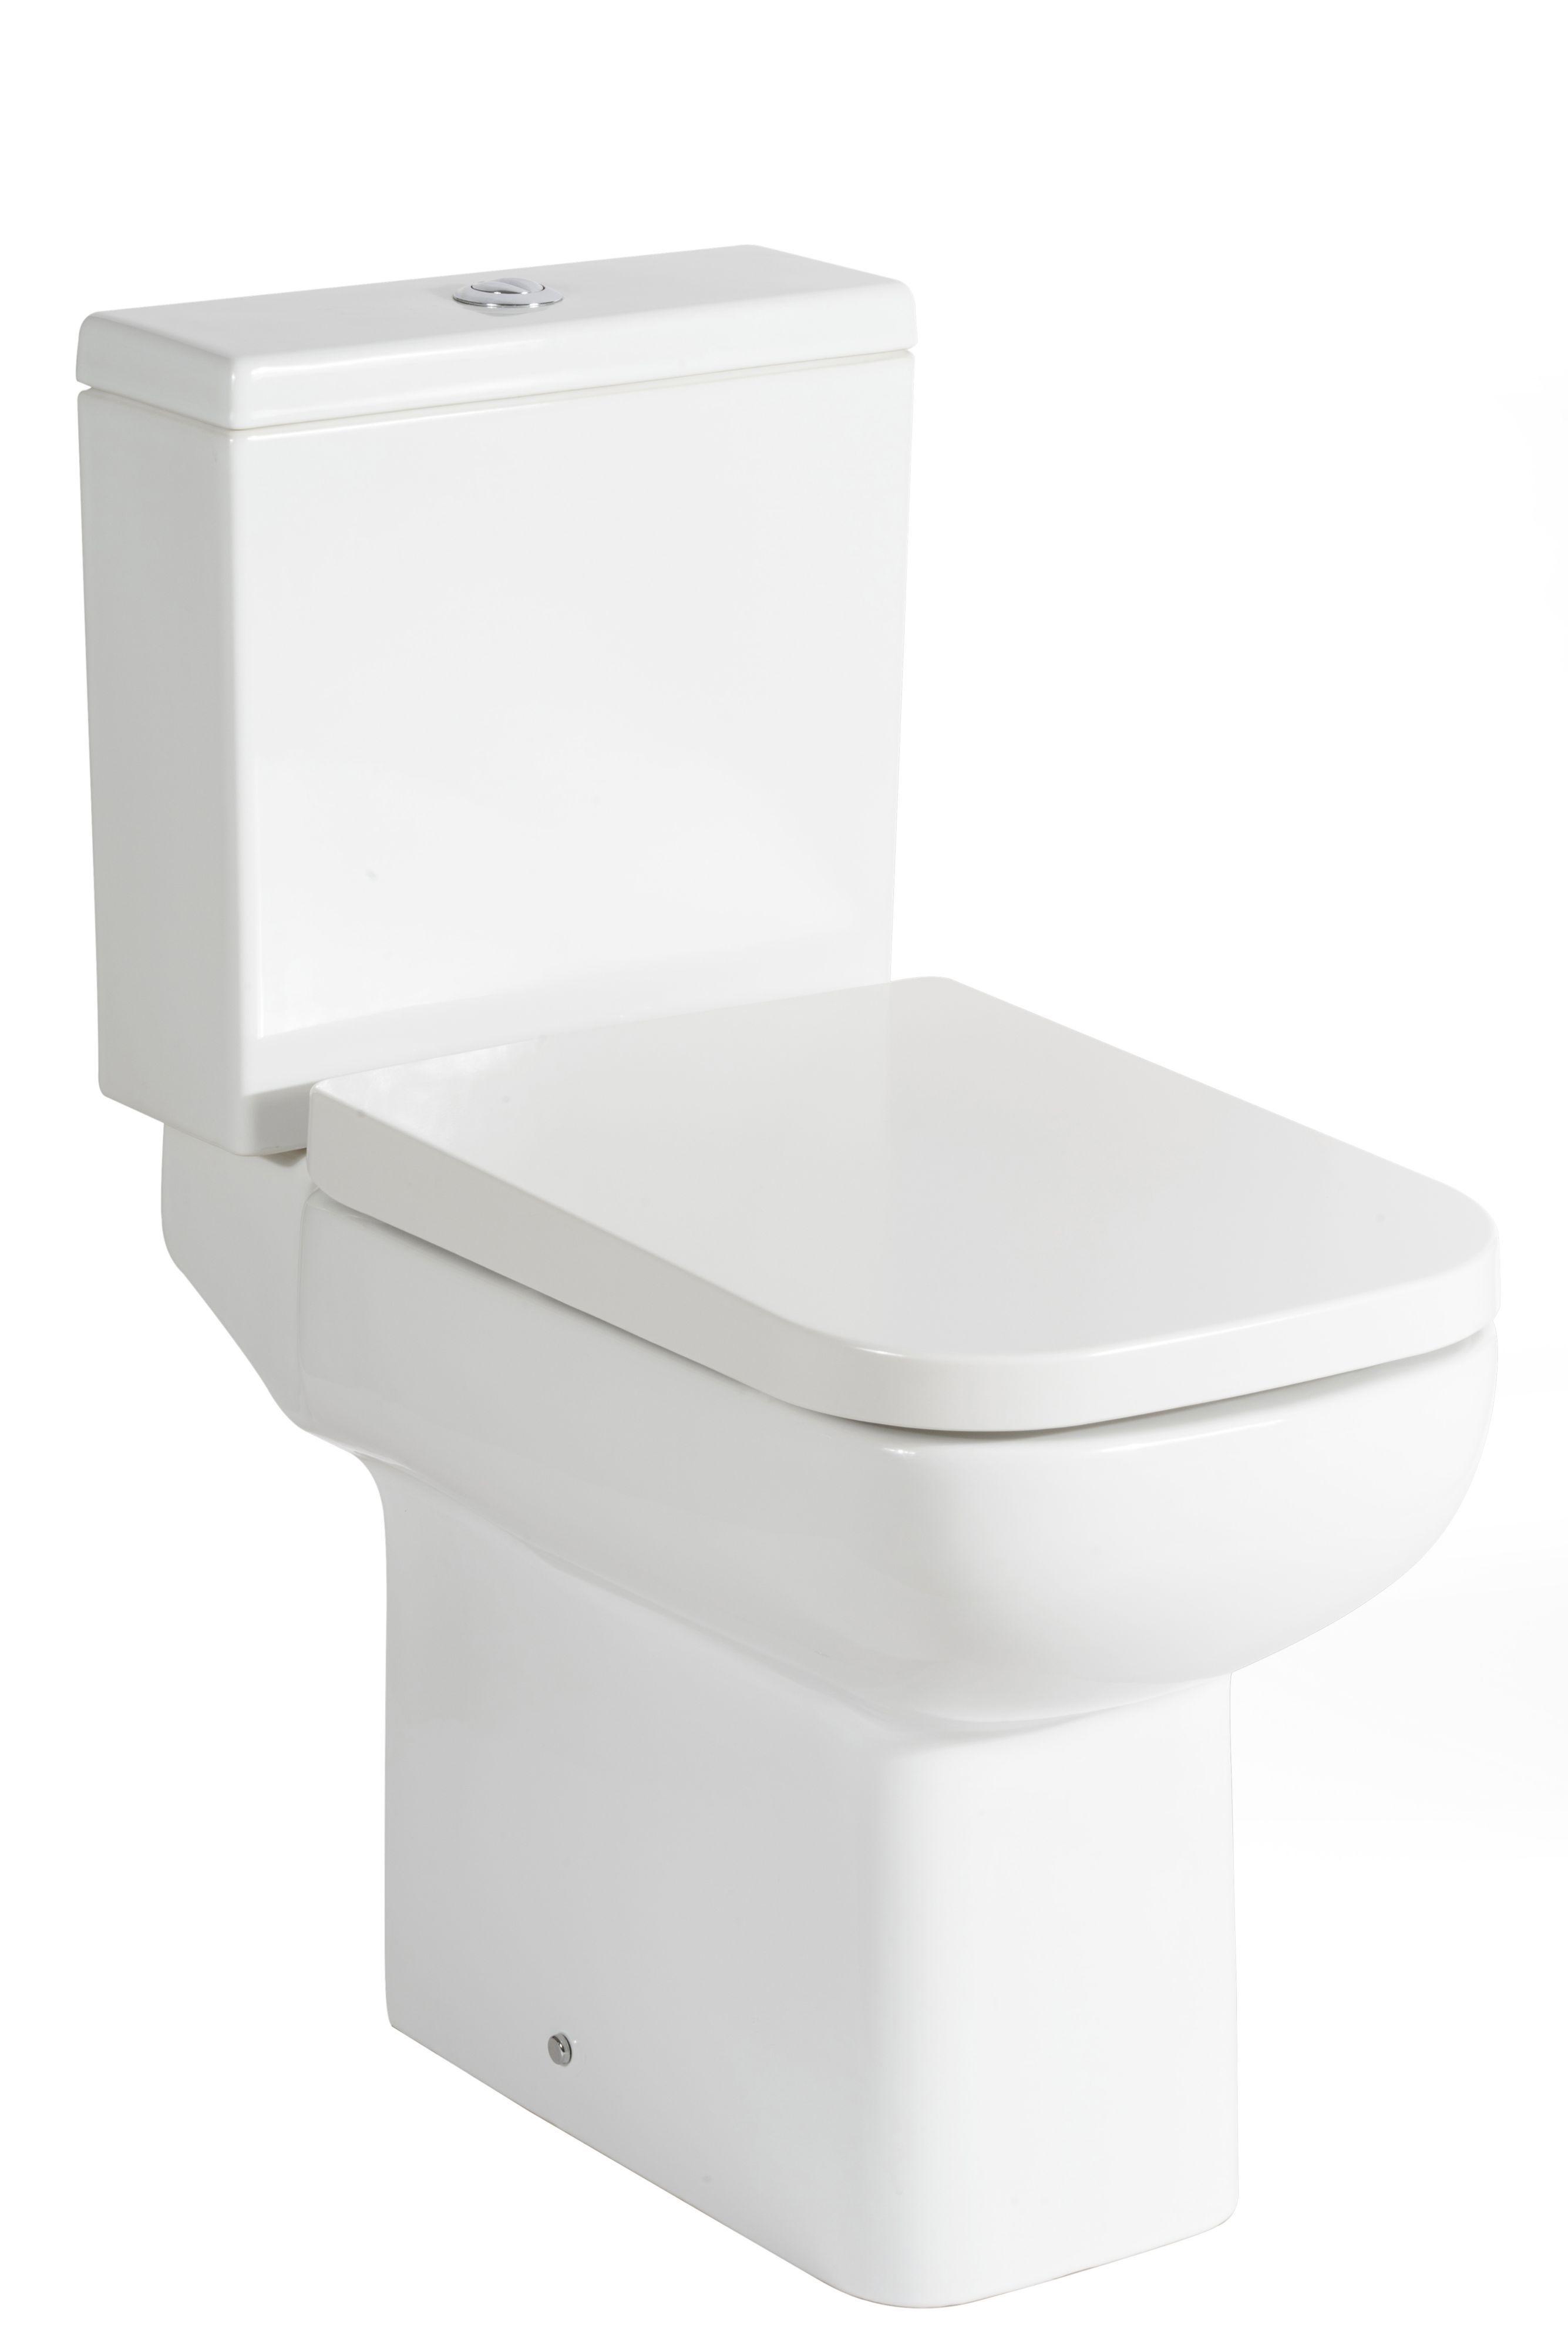 Terrific Cooke Lewis Fabienne Close Coupled Toilet With Soft Close Machost Co Dining Chair Design Ideas Machostcouk